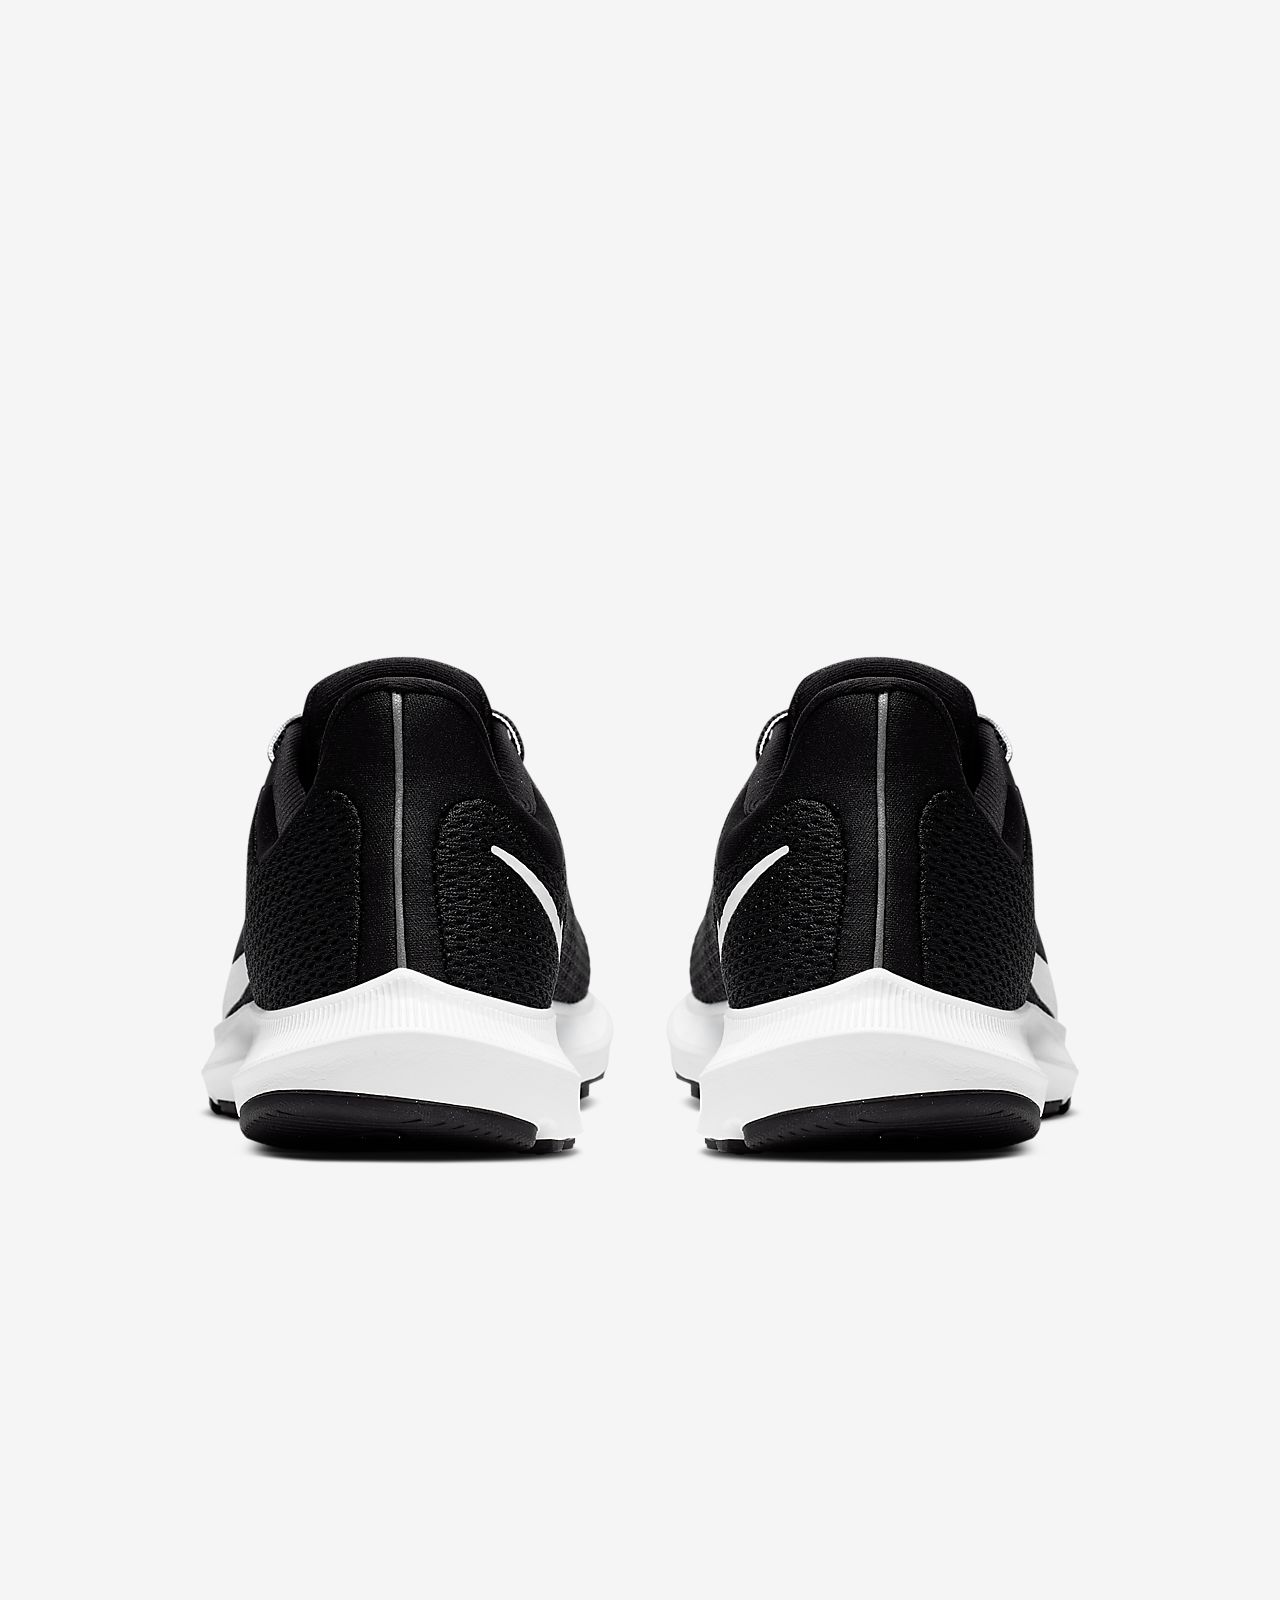 Nike Femme Chaussure running 2 de Quest pour Kl1FTJc3